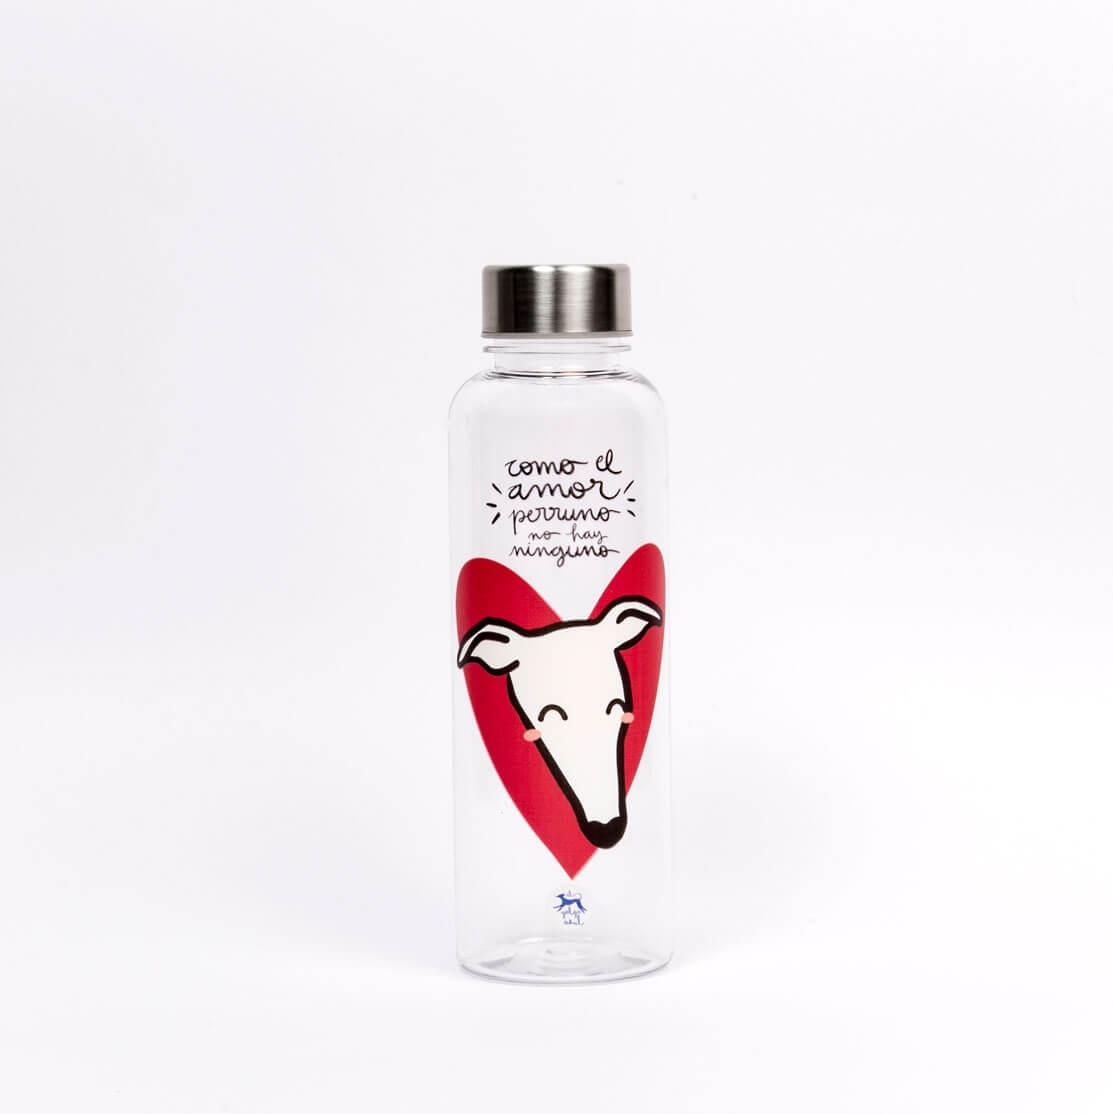 Botella Amor perruno